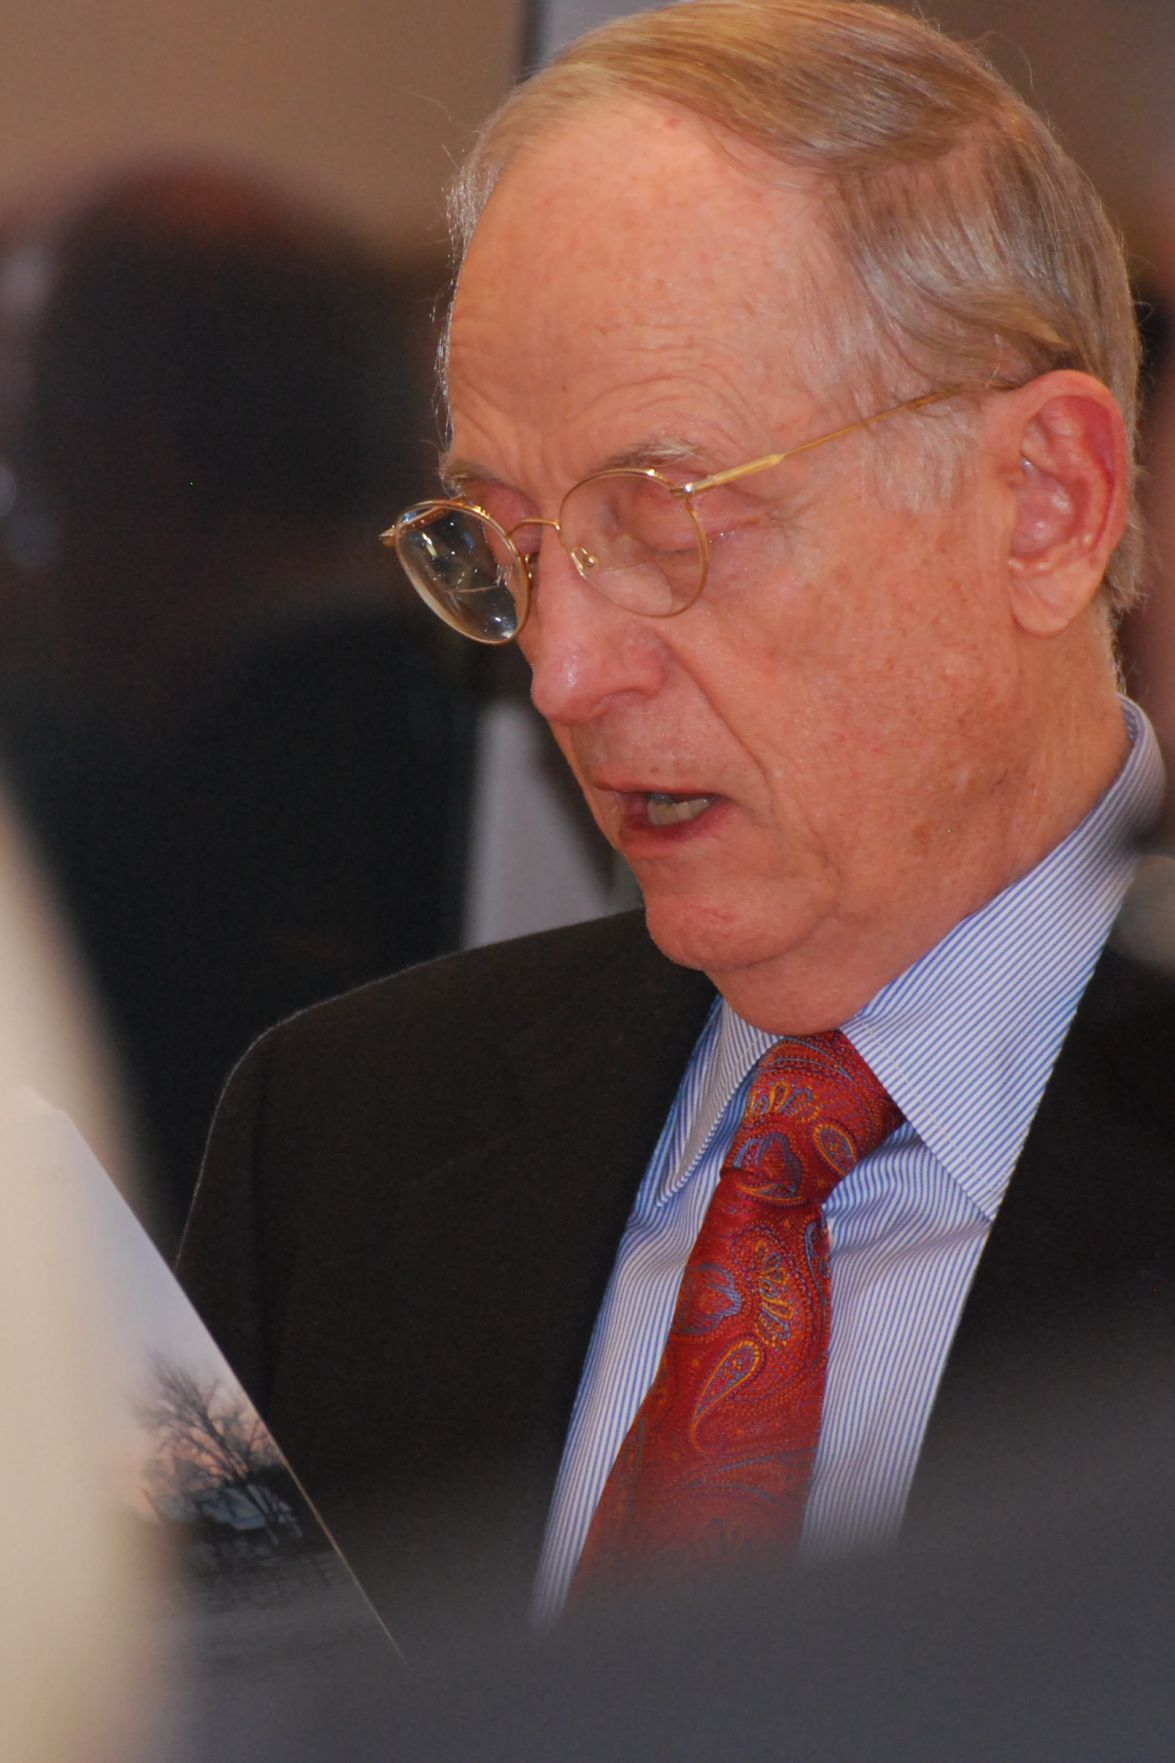 James Applewhite